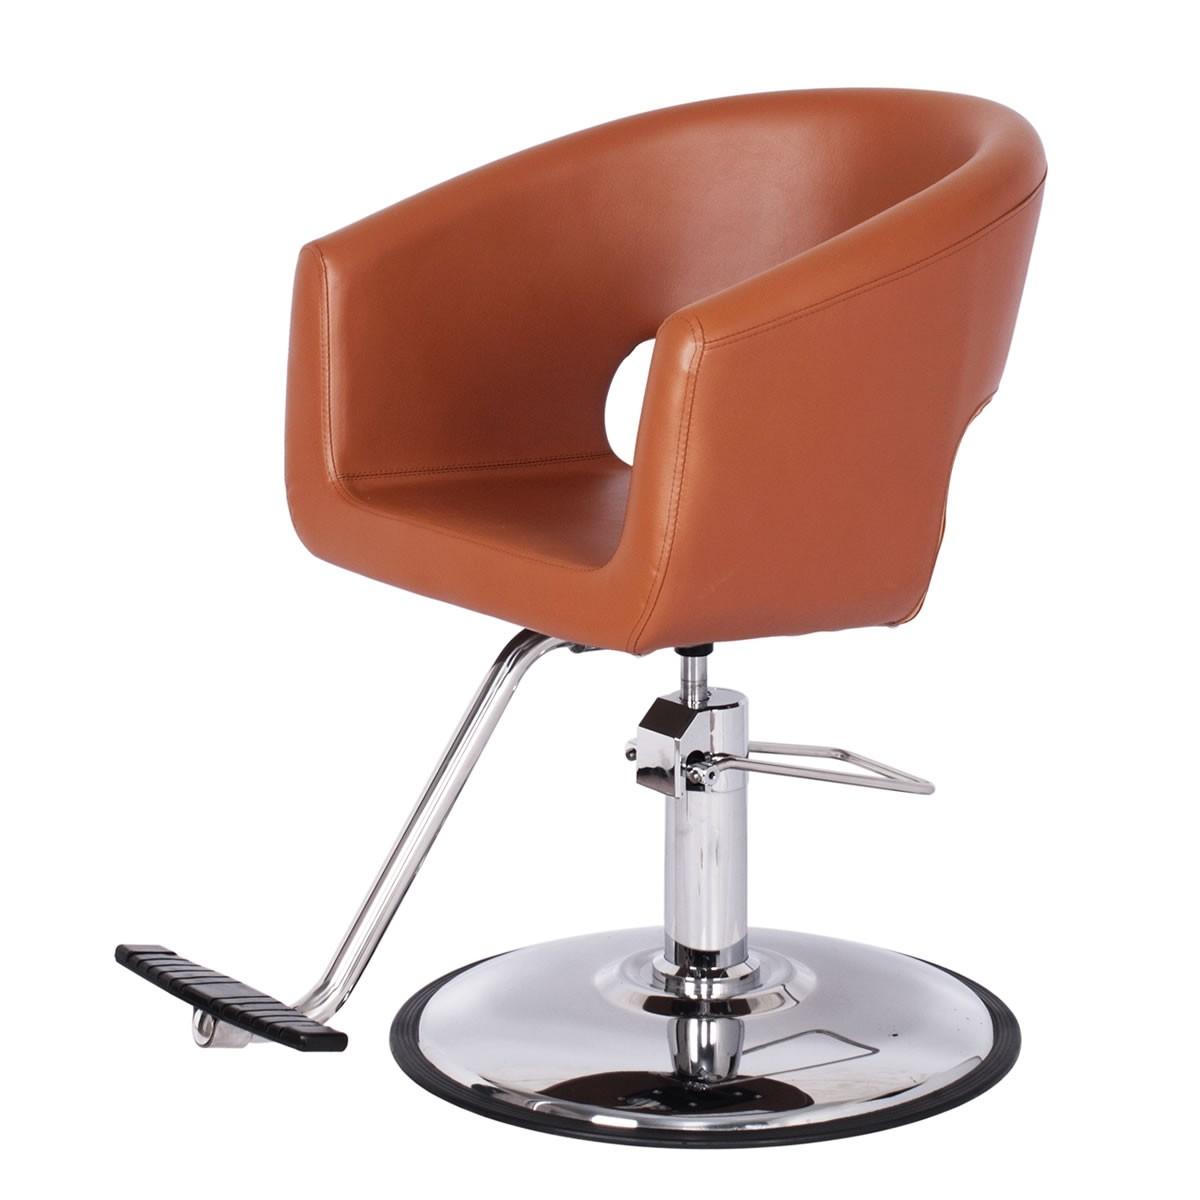 """MAGNUM"" Salon Styling Chair in Chestnut"